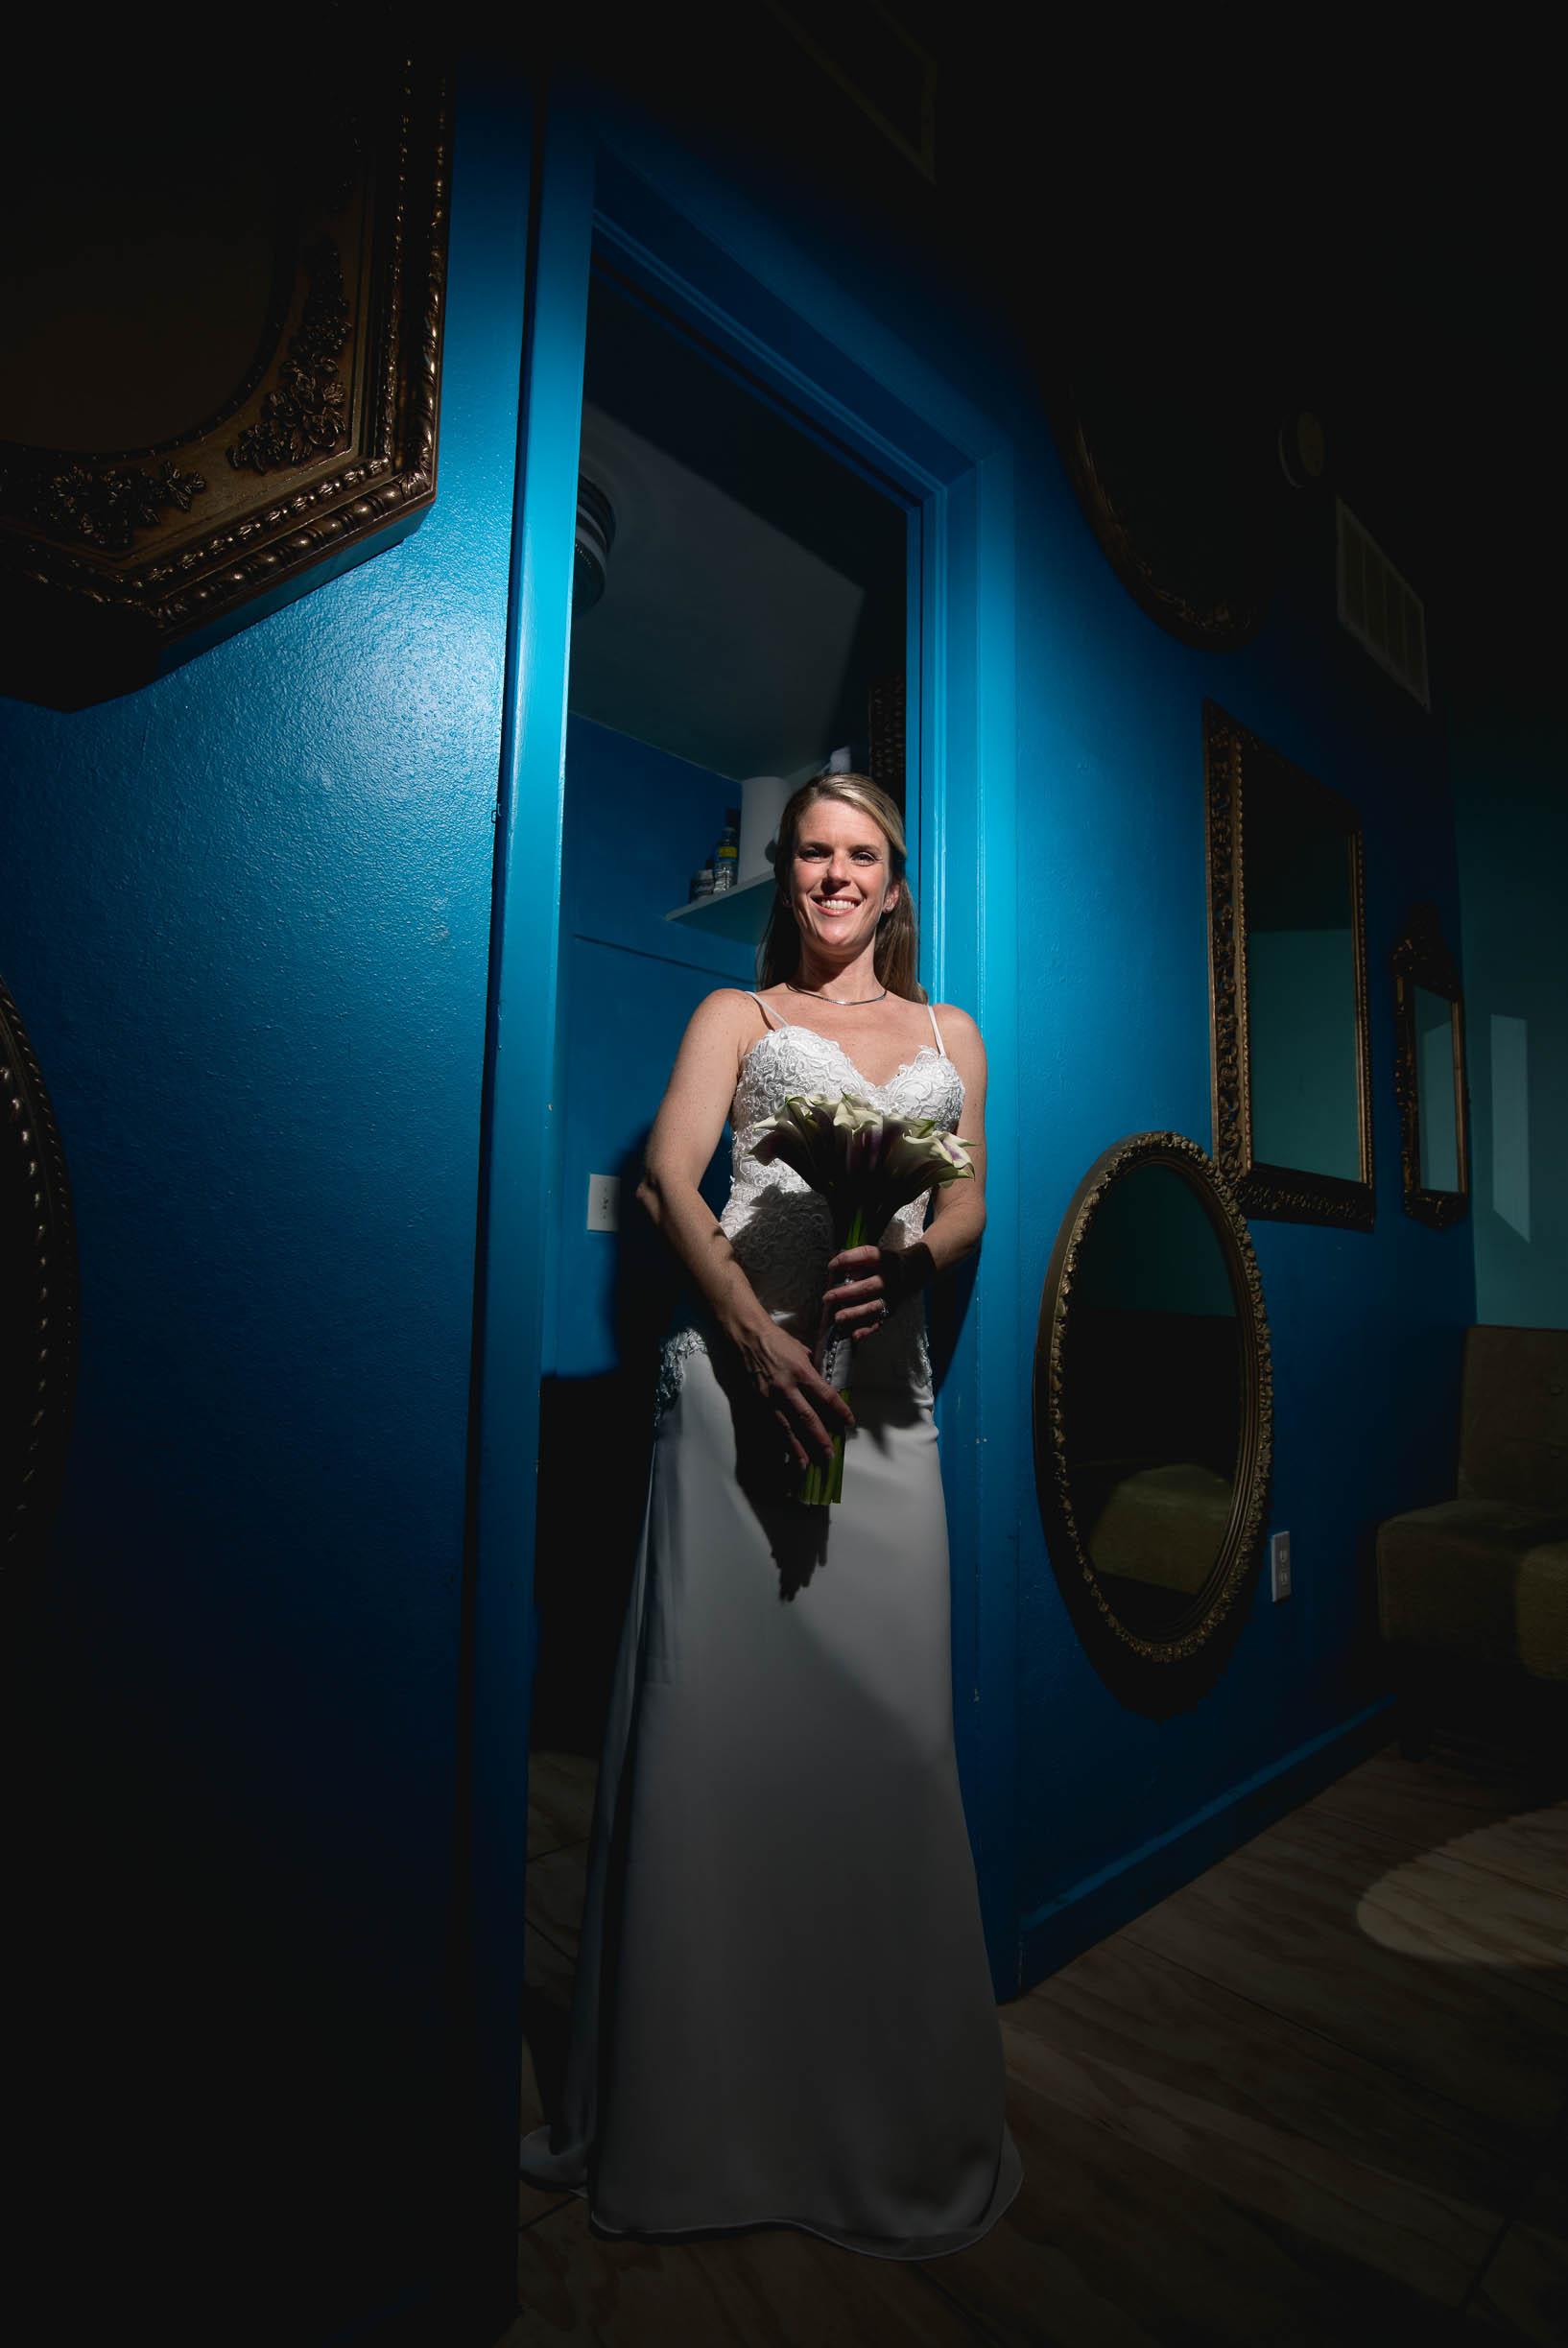 013Portland Wedding Photographer timothy capp.jpg